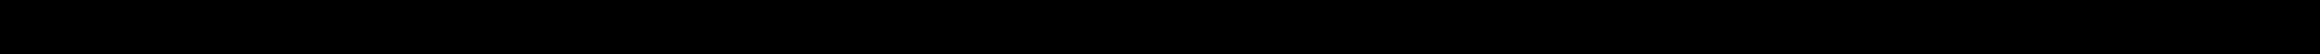 MOBILETRON K262266, 6133746, 84AB-10316AA, 1865974M1, 1897699M91 Jänniteensäädin